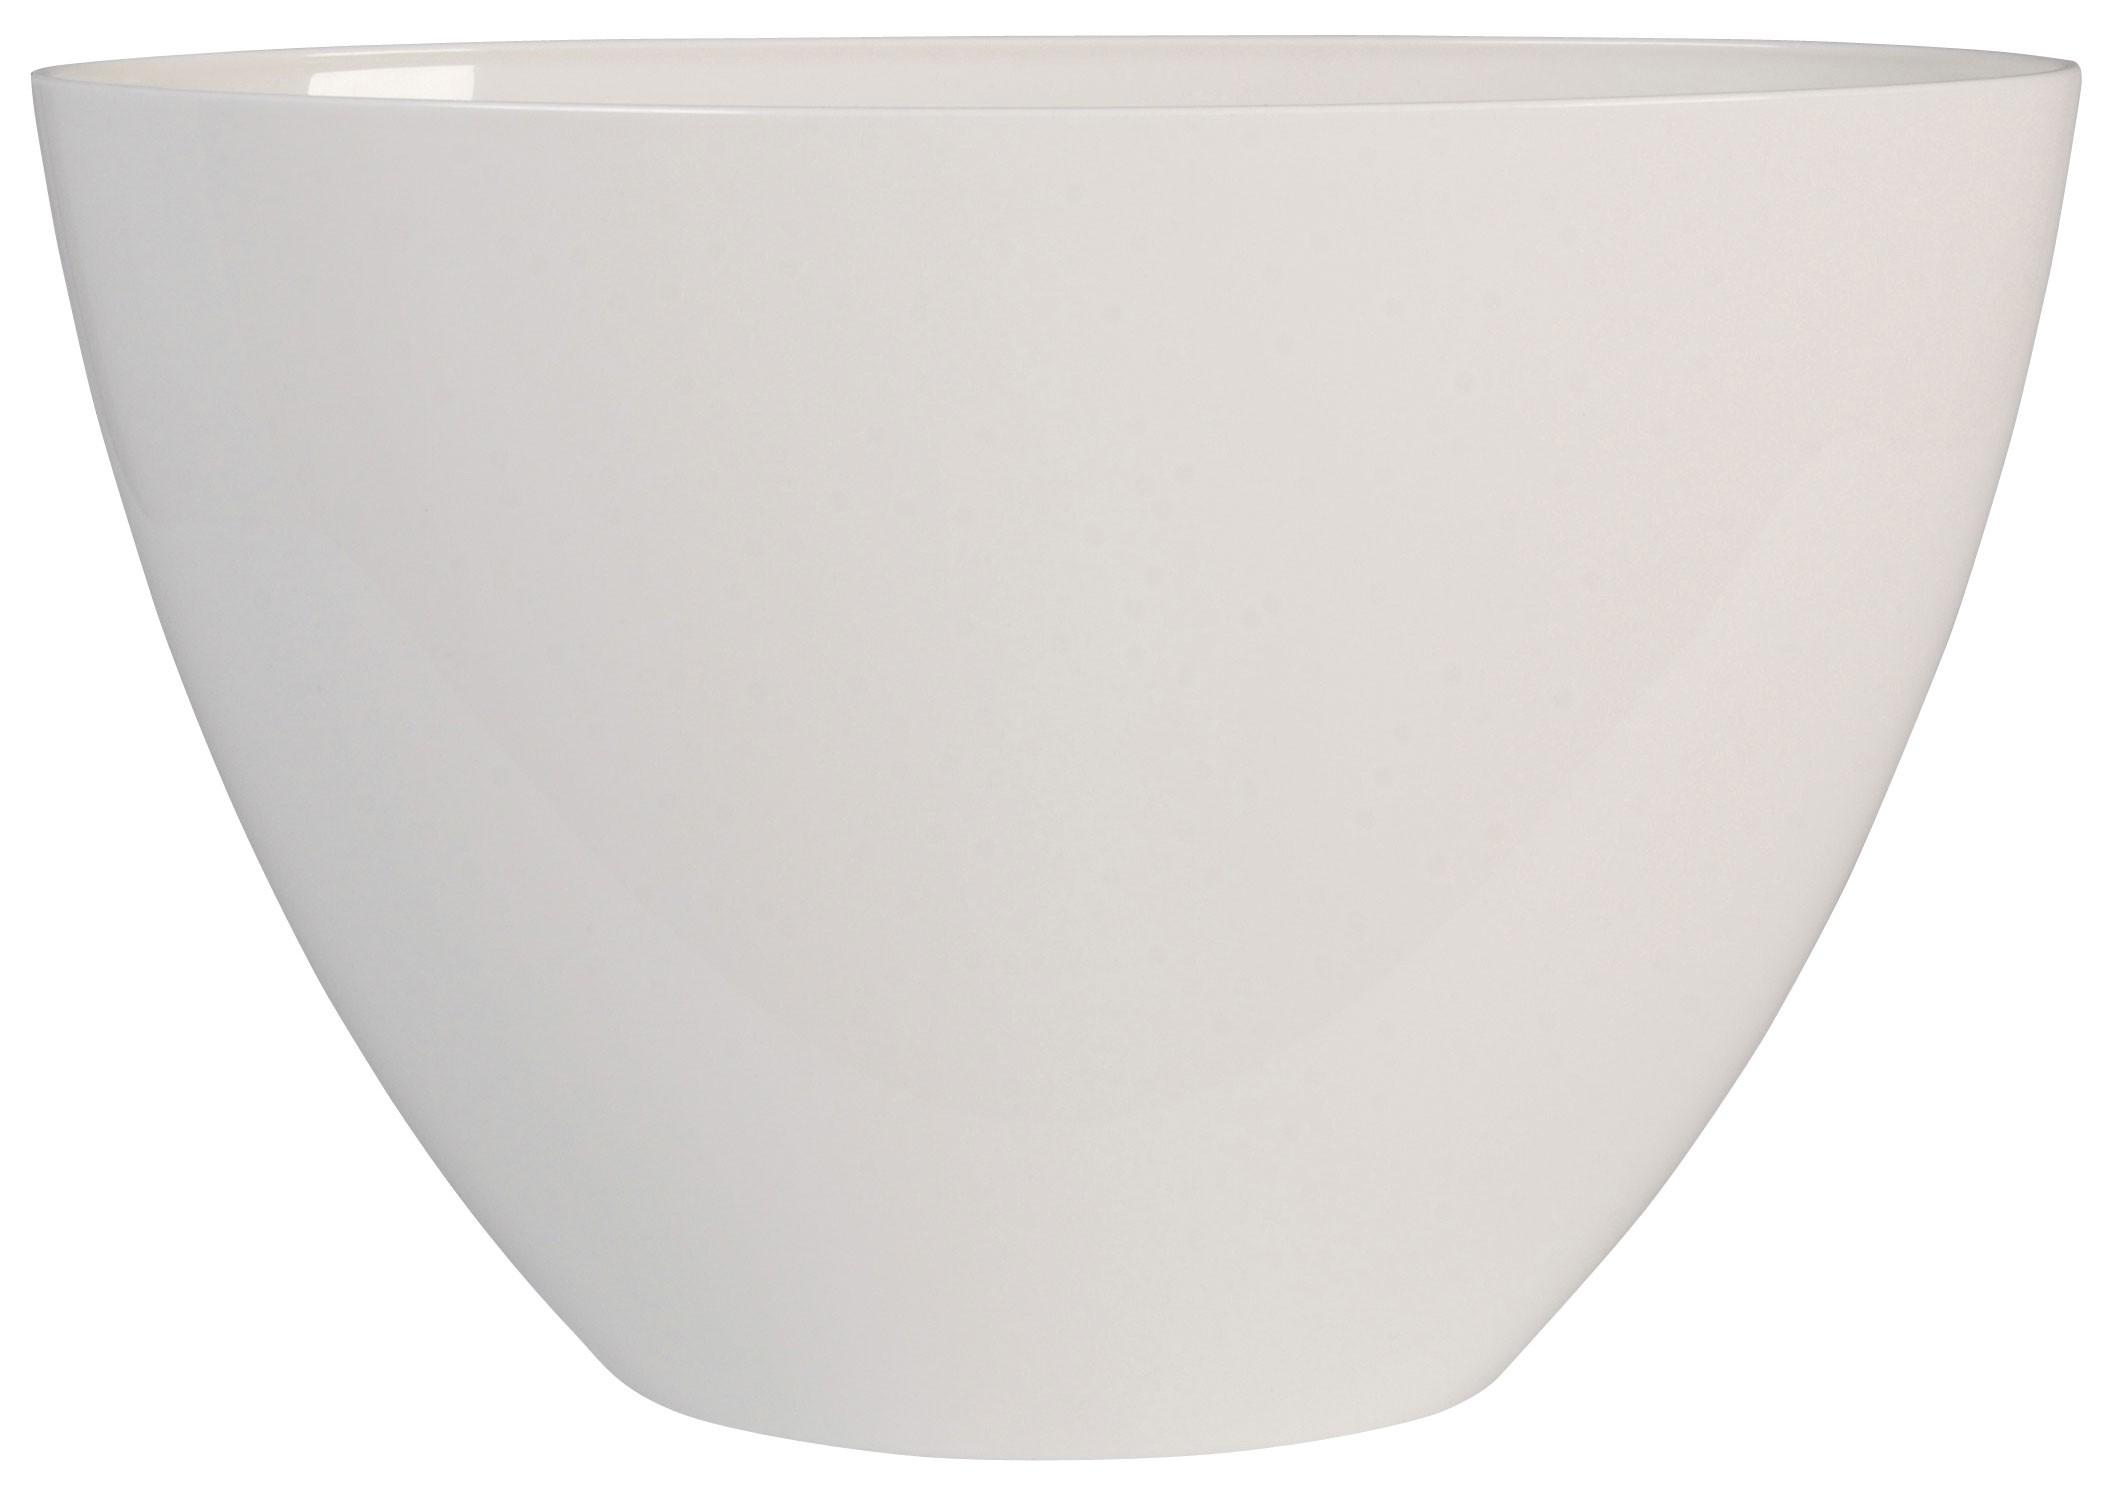 Blumentopf elho Brüssel Diamond oval High 36x18x23,5cm weiß Bild 1